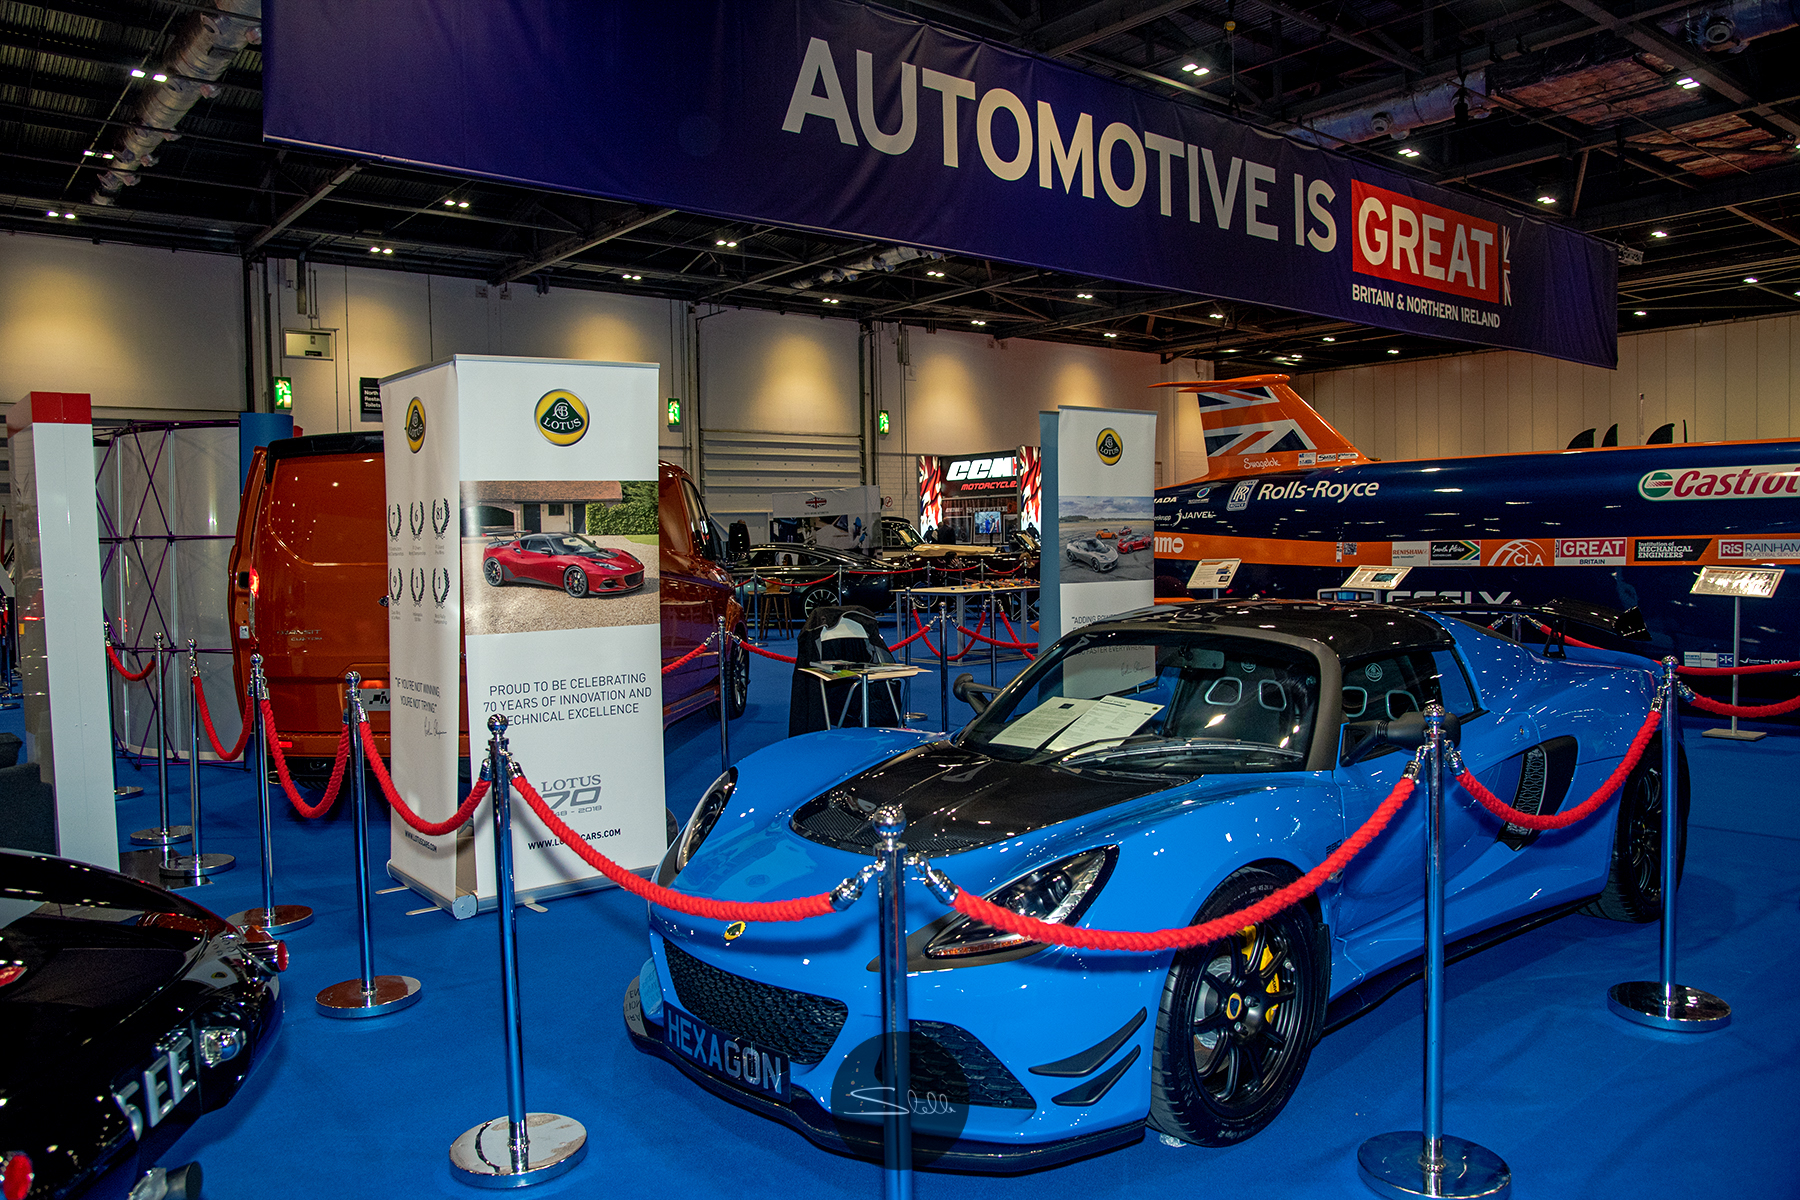 Stella Scordellis The London Motor Show 2018 2 Watermarked.jpg